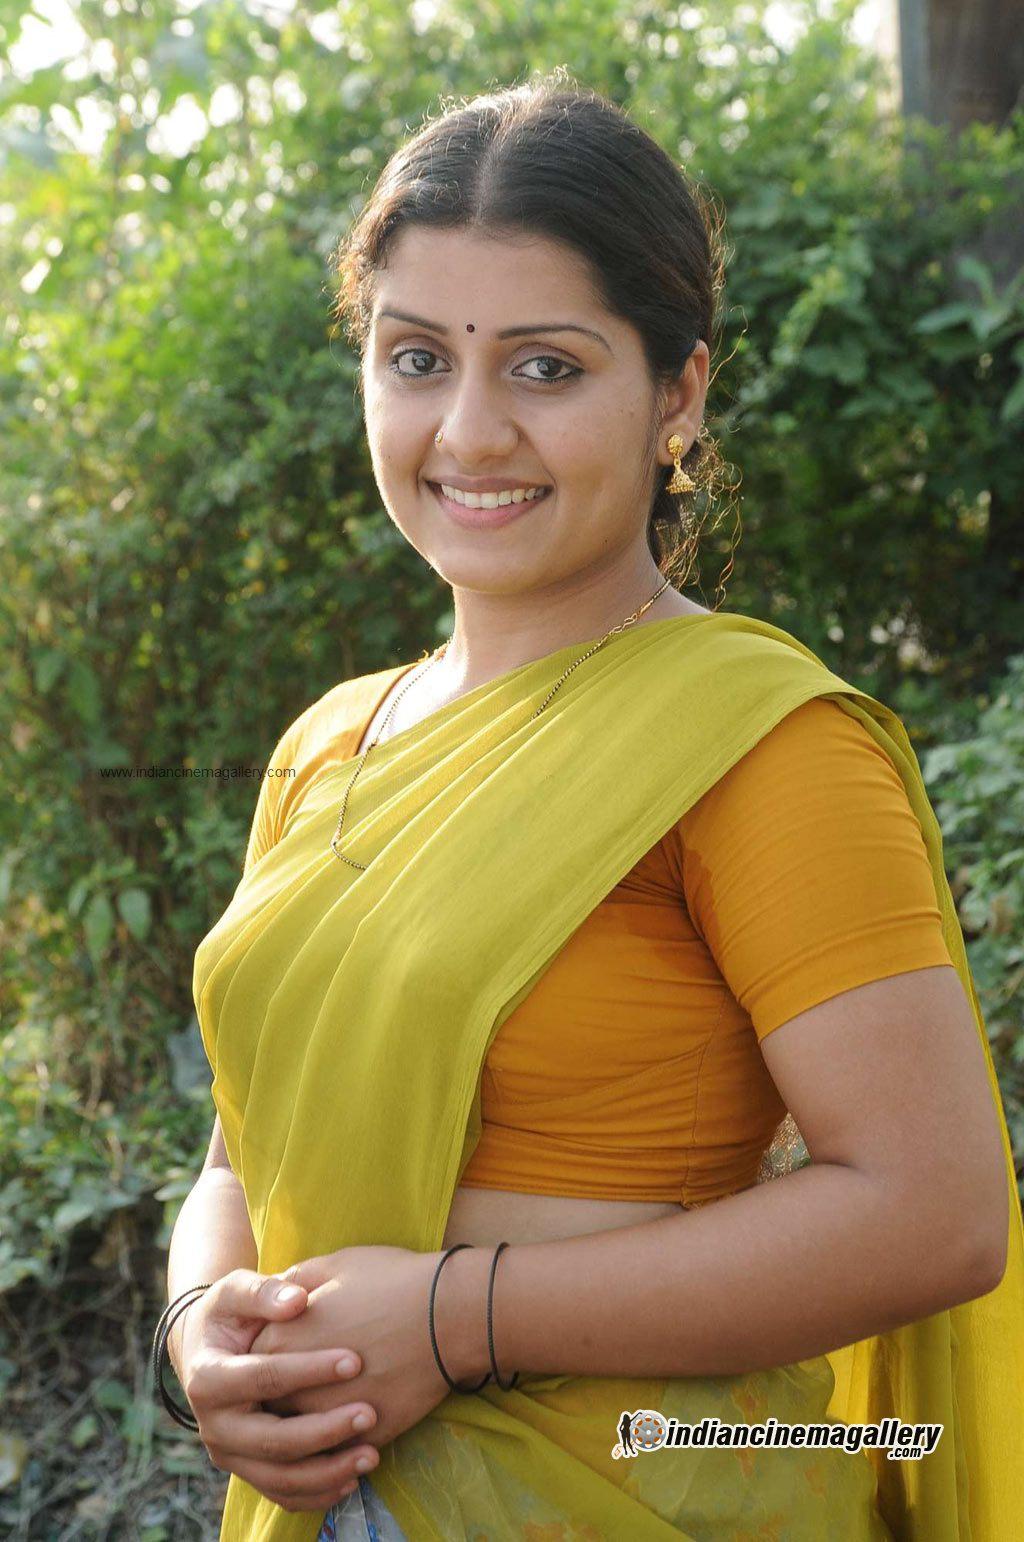 Mallu Malayalam actress Sarayu hot show in saree from tamil movie